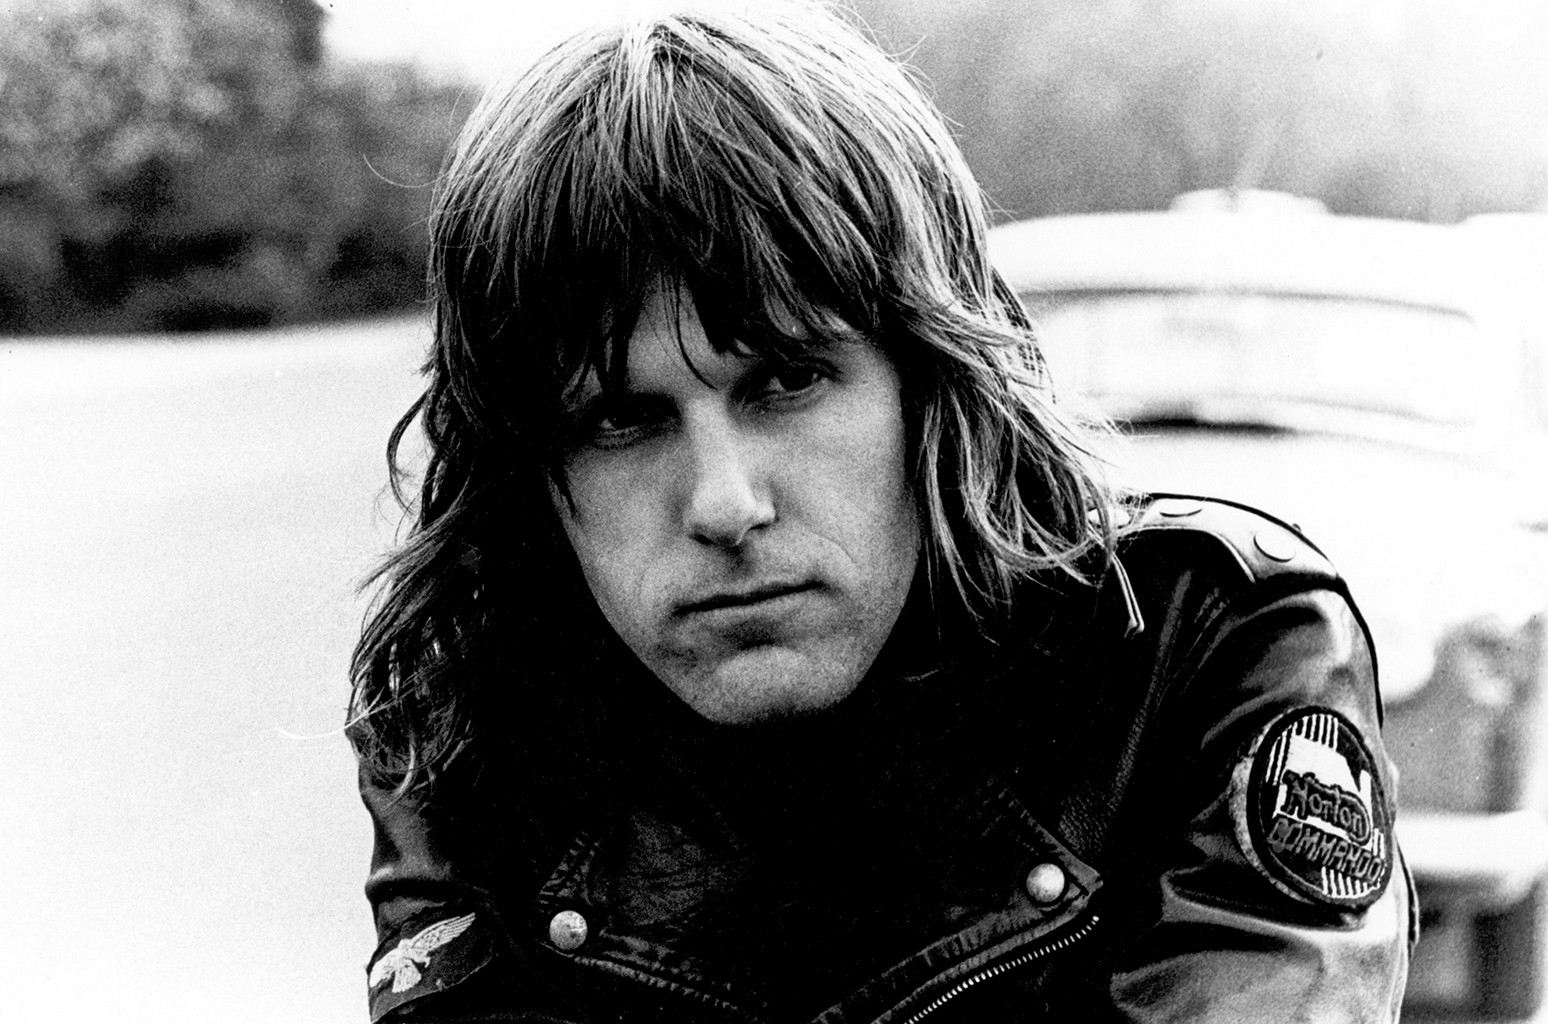 Keith Emerson photographed circa 1970.